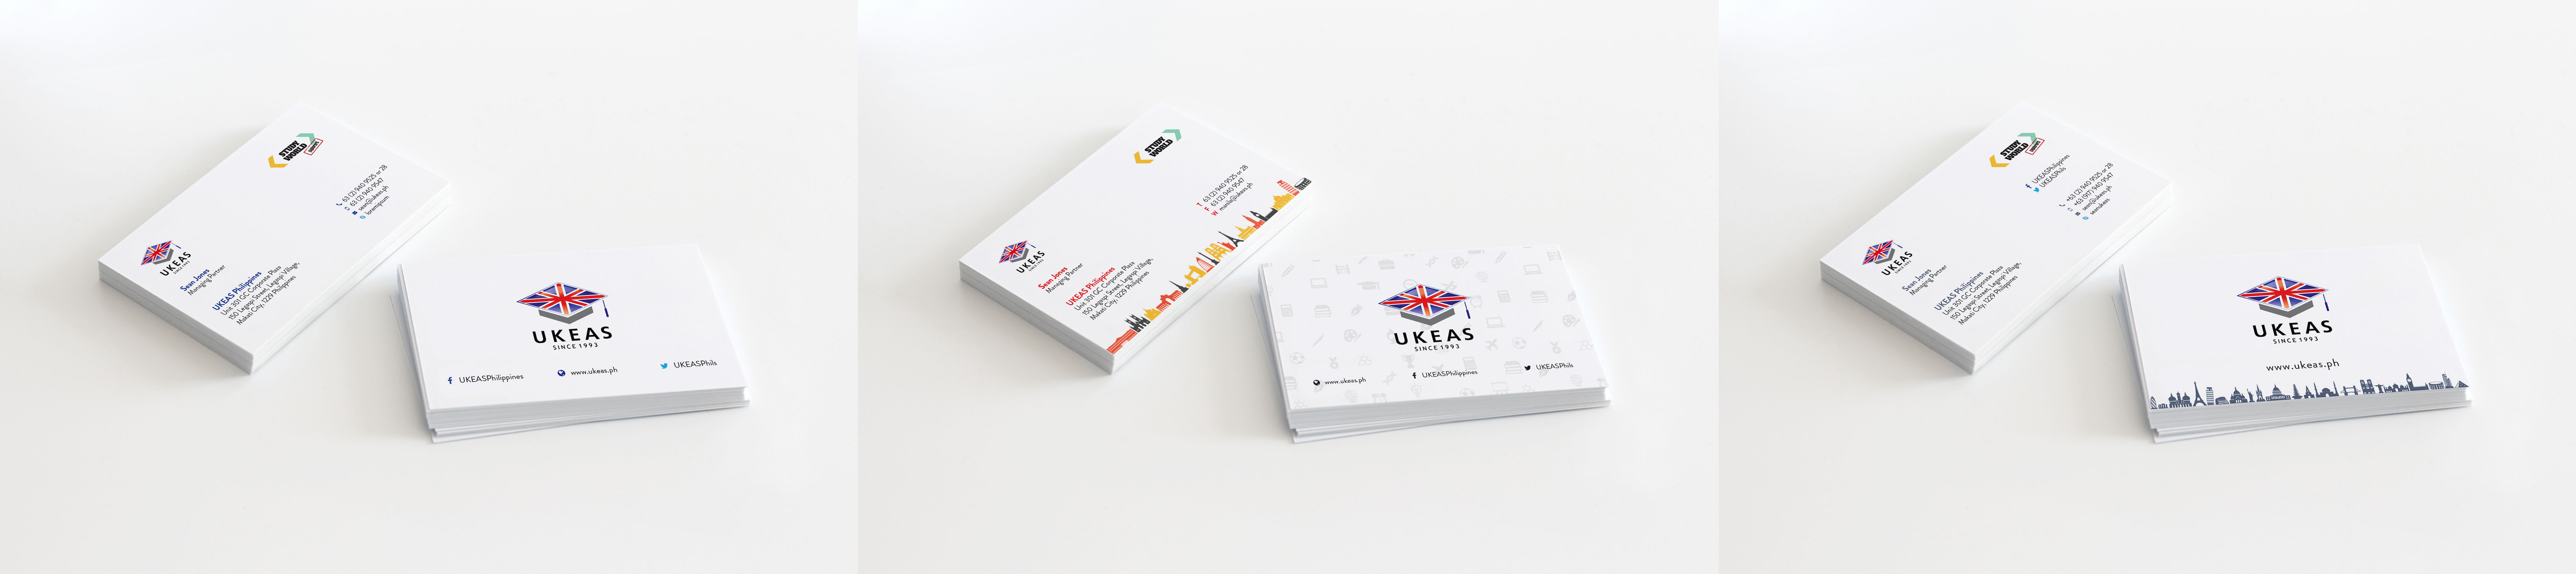 UKEAS Business Cards - Centaur Marketing